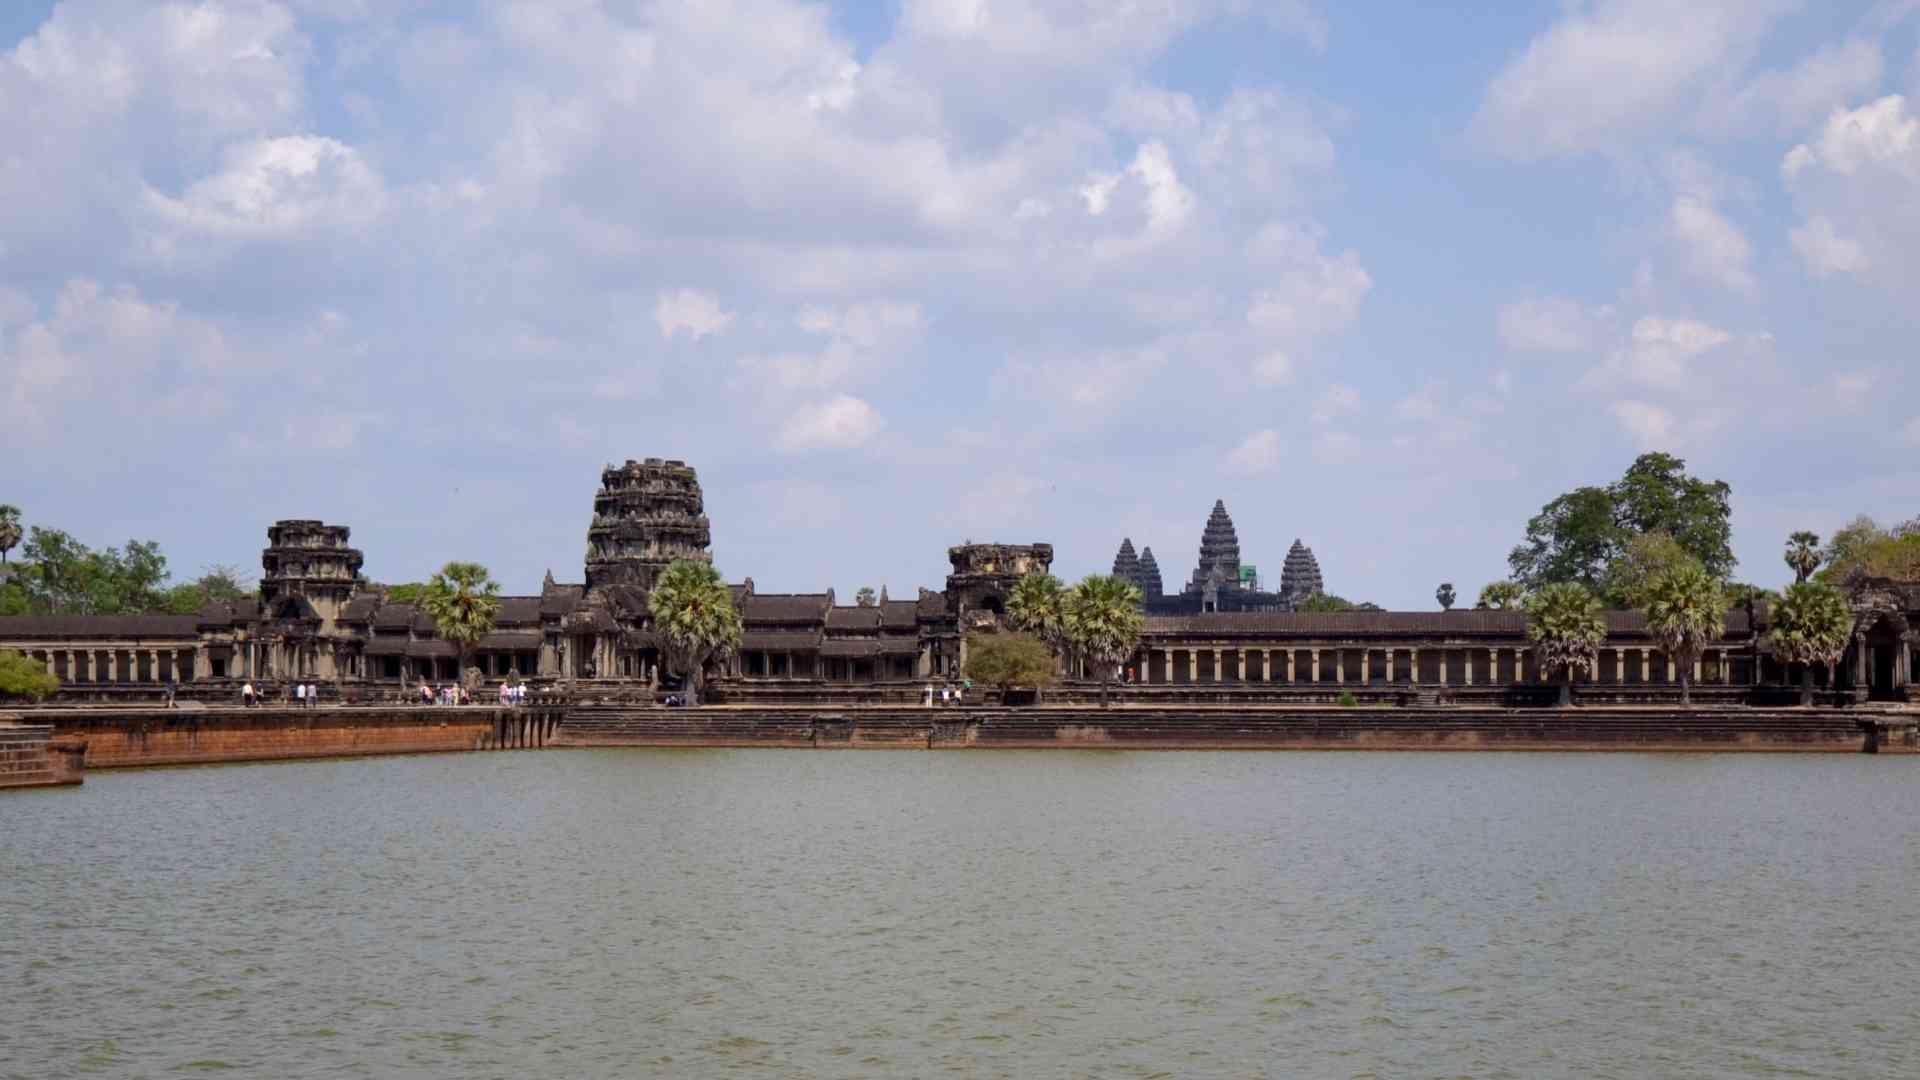 Angkor Wat, Cambodia by Victoria Hearn